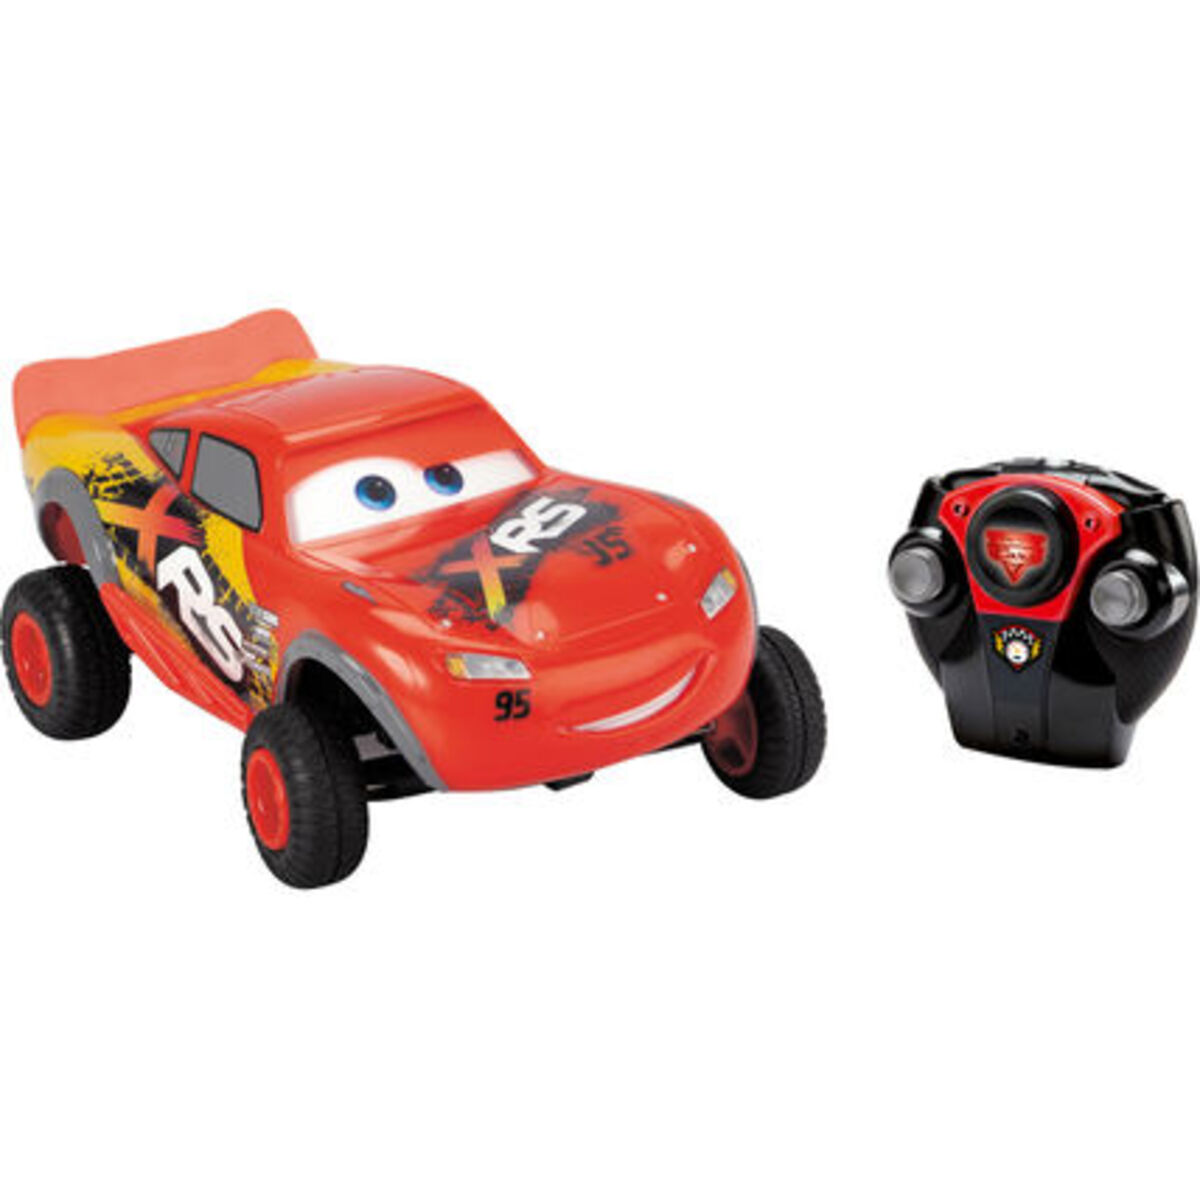 Bild 1 von Dickie Toys Disney Cars RC Lightning McQueen XRS